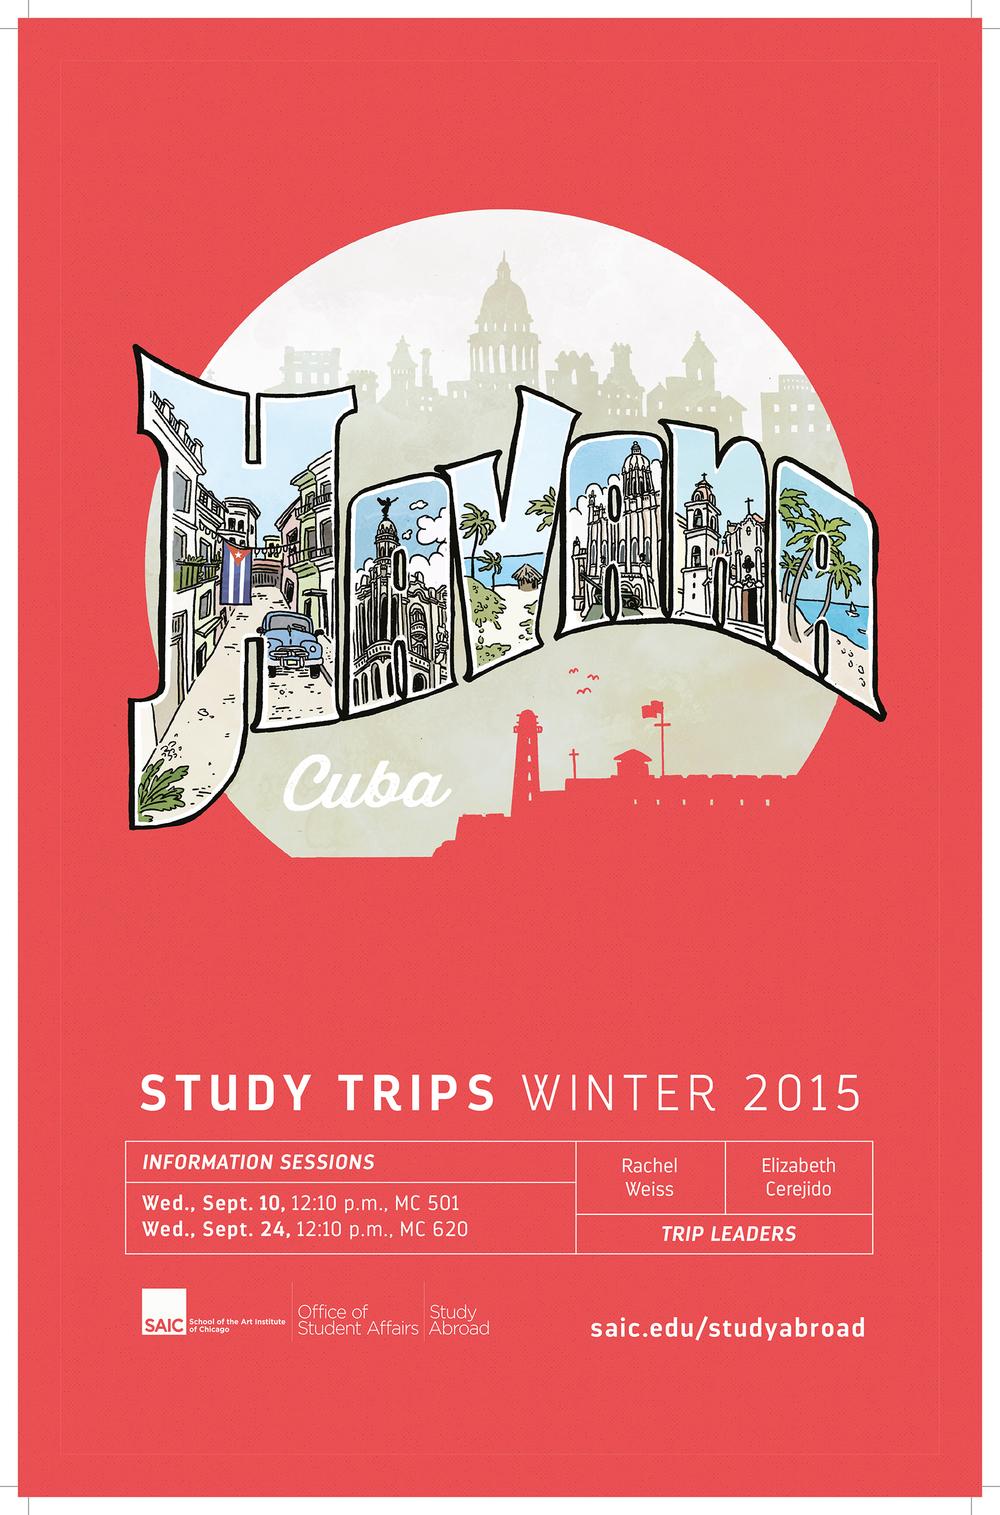 StudyTripWinter2015 4_small.jpg